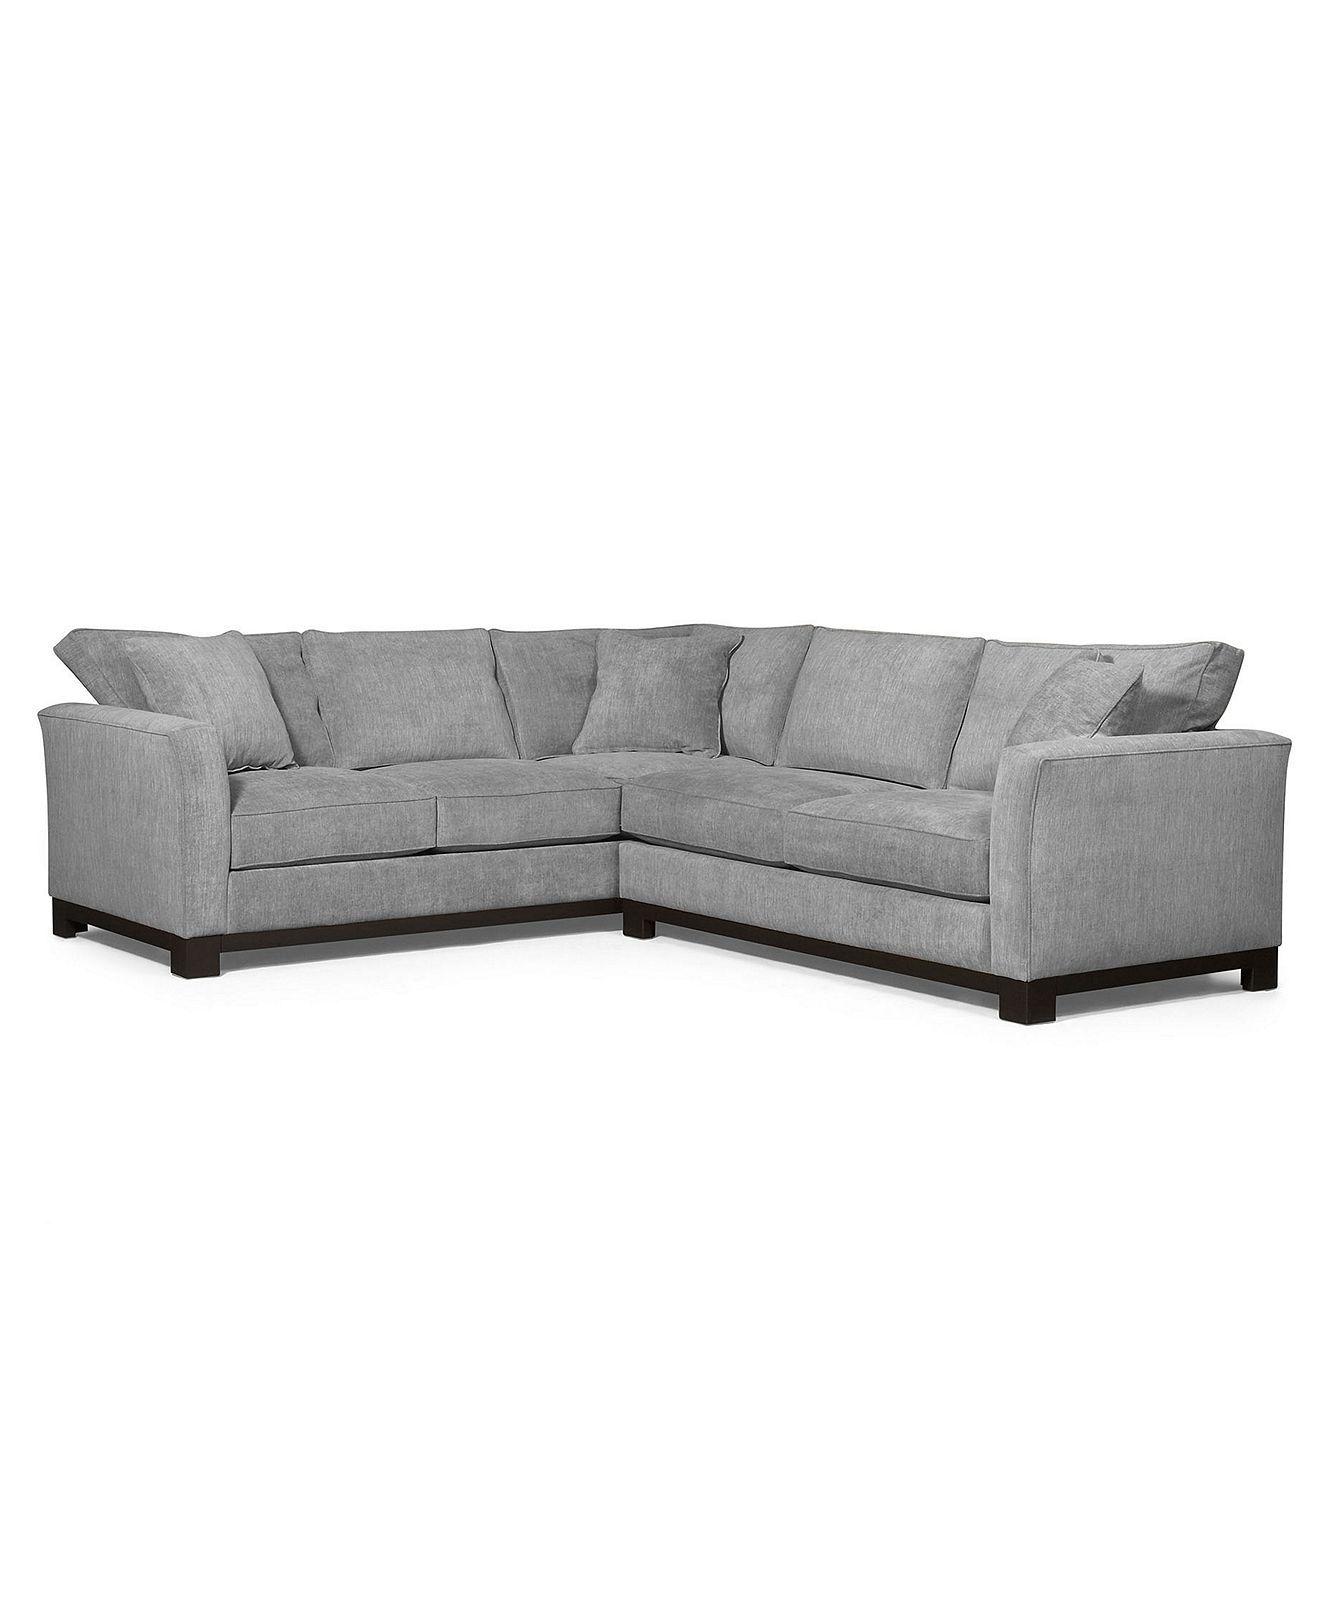 Macys Sectional Sofa Microfiber Danish Style Melbourne Kenton Fabric 2 Piece 107w X 94d 33h